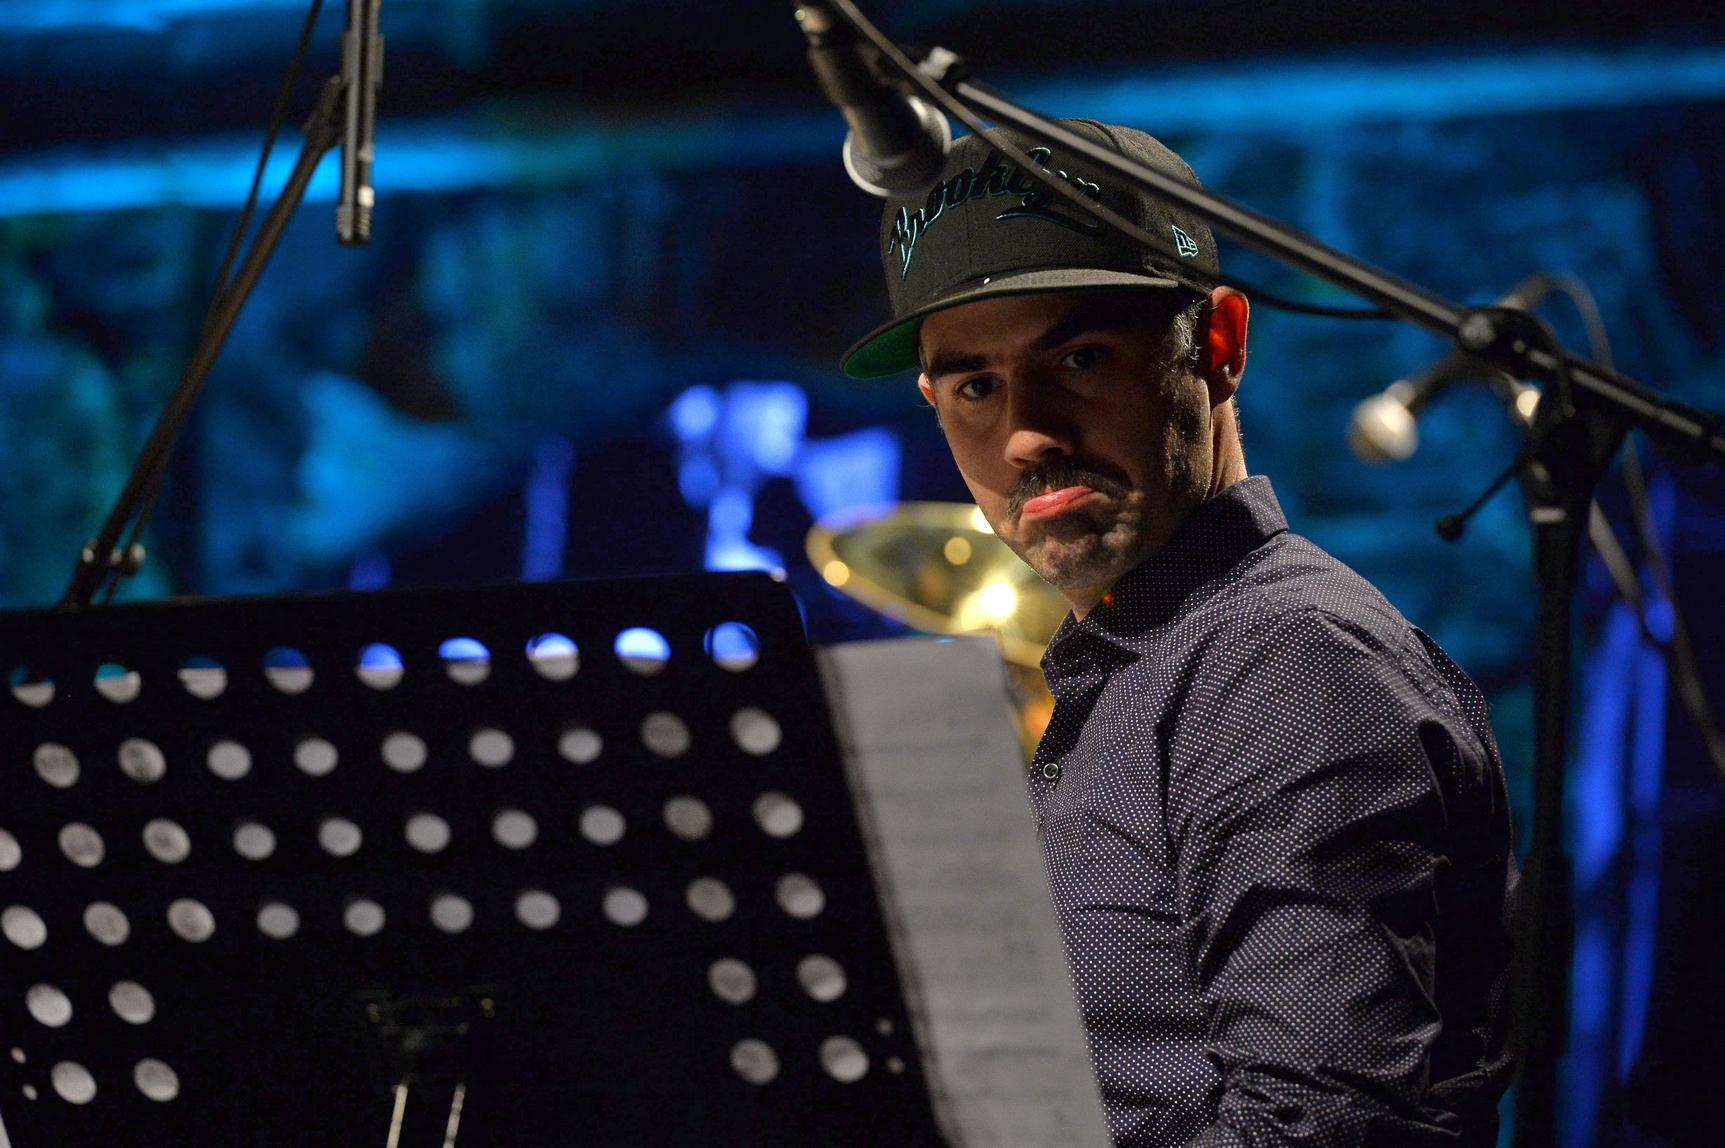 Srdjan Ivanovic with Undectet :Aristry In Broken Rhythm